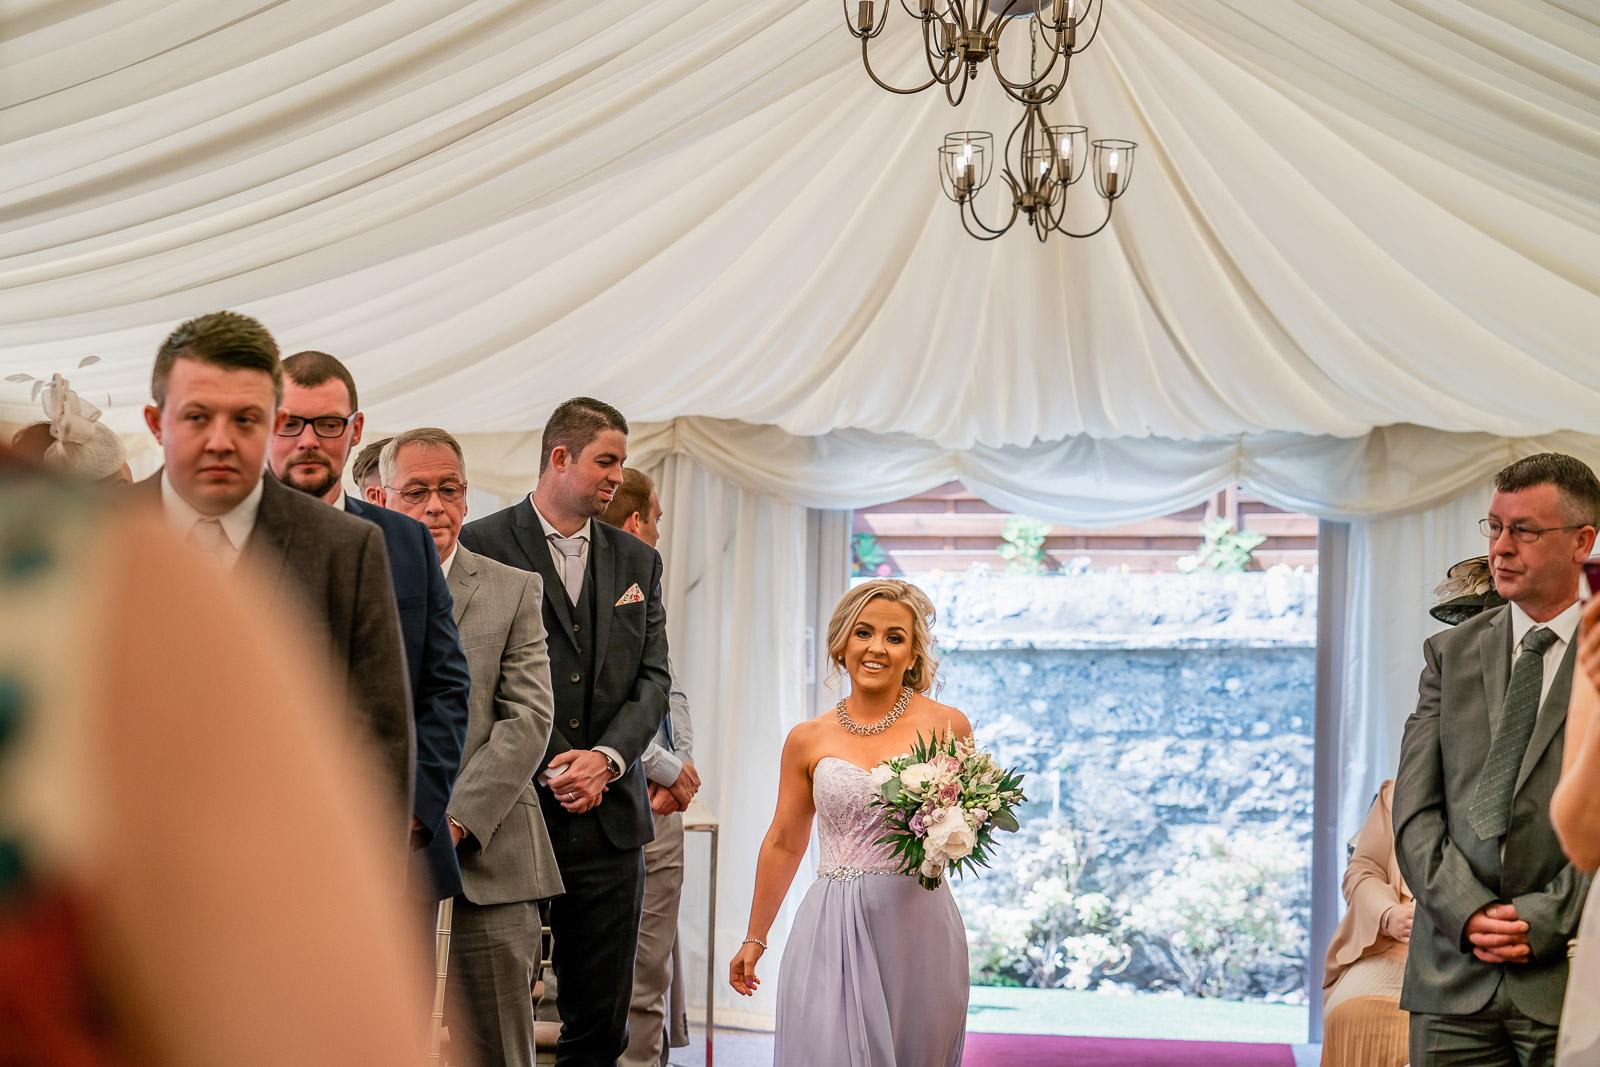 cornhill_castle_wedding_biggar_dearlyphotography (84 of 448).jpg